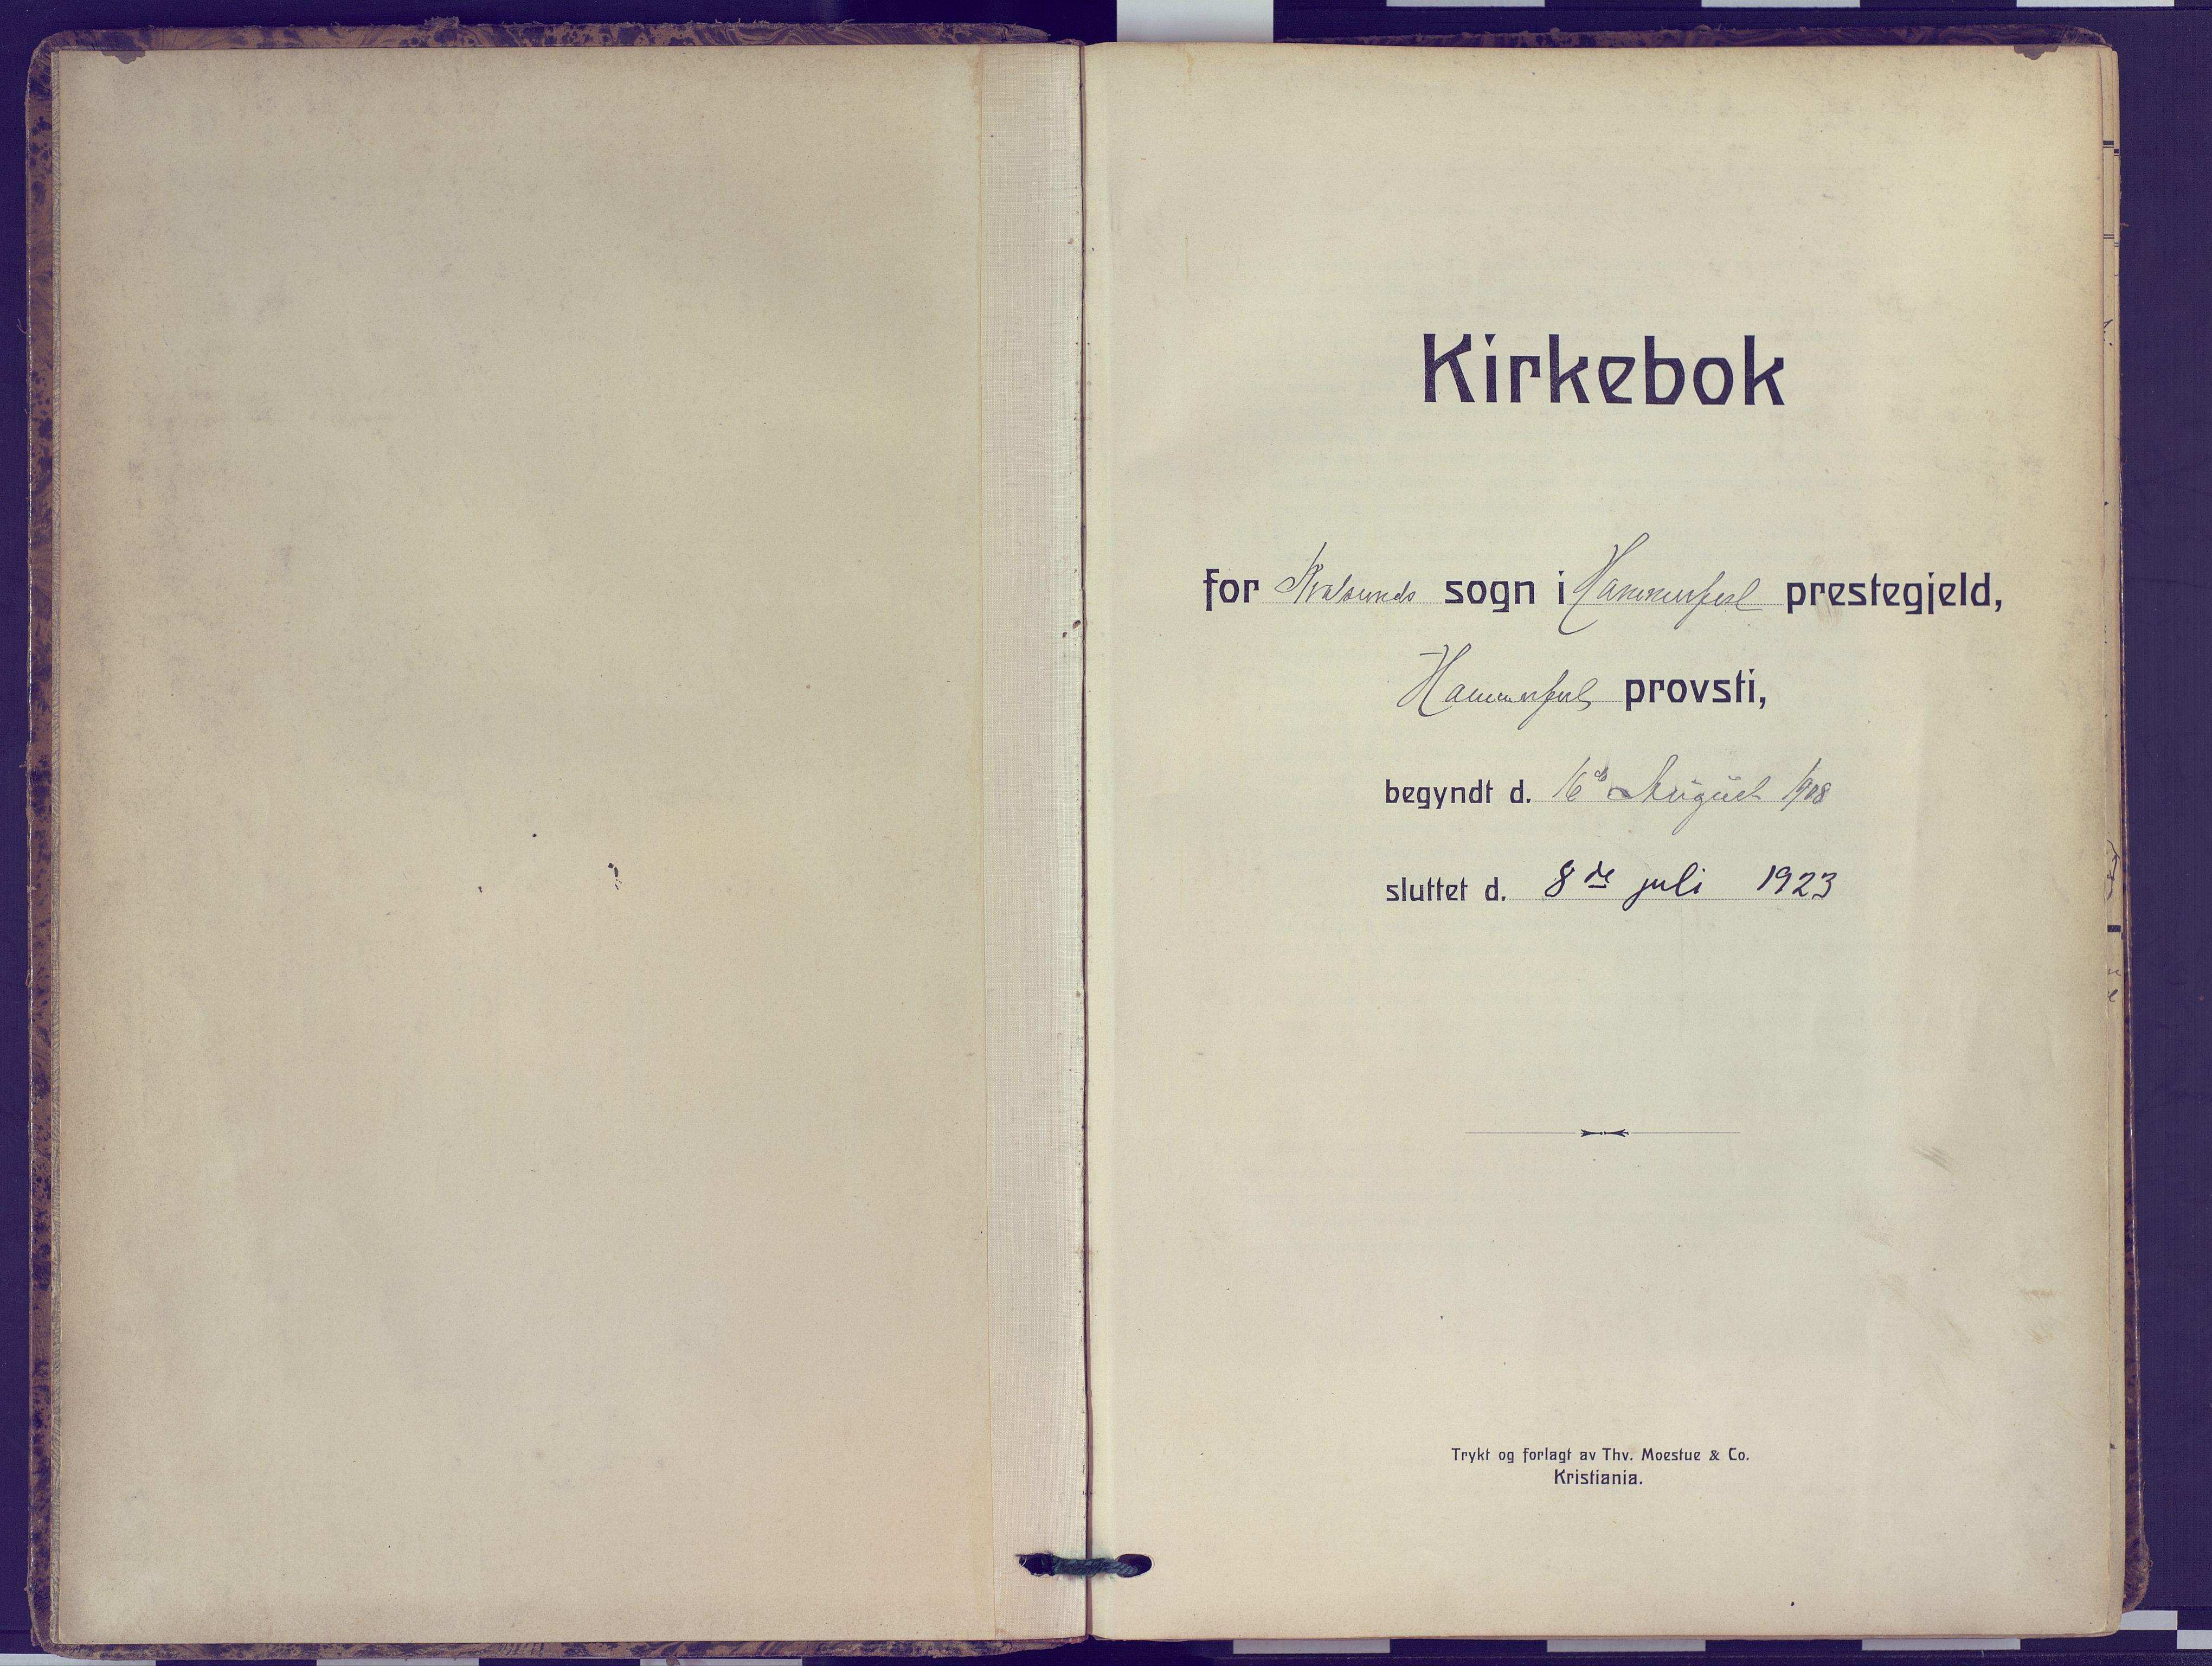 SATØ, Hammerfest sokneprestembete, Ministerialbok nr. 16, 1908-1923